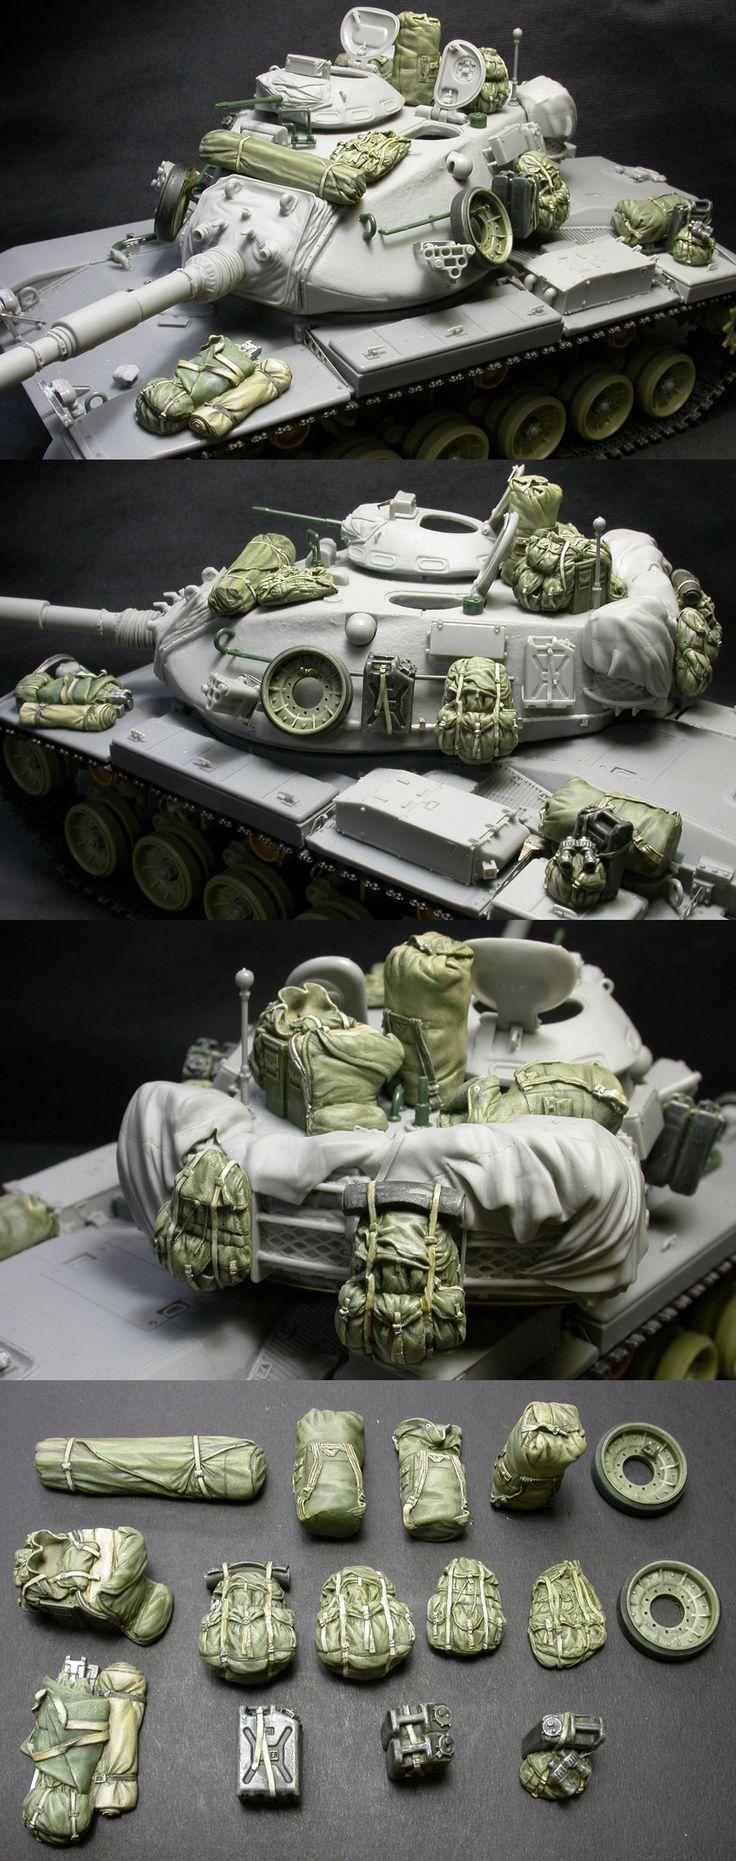 1/35 resincast model U.S. M60A1/A3 Stowage & Accessory